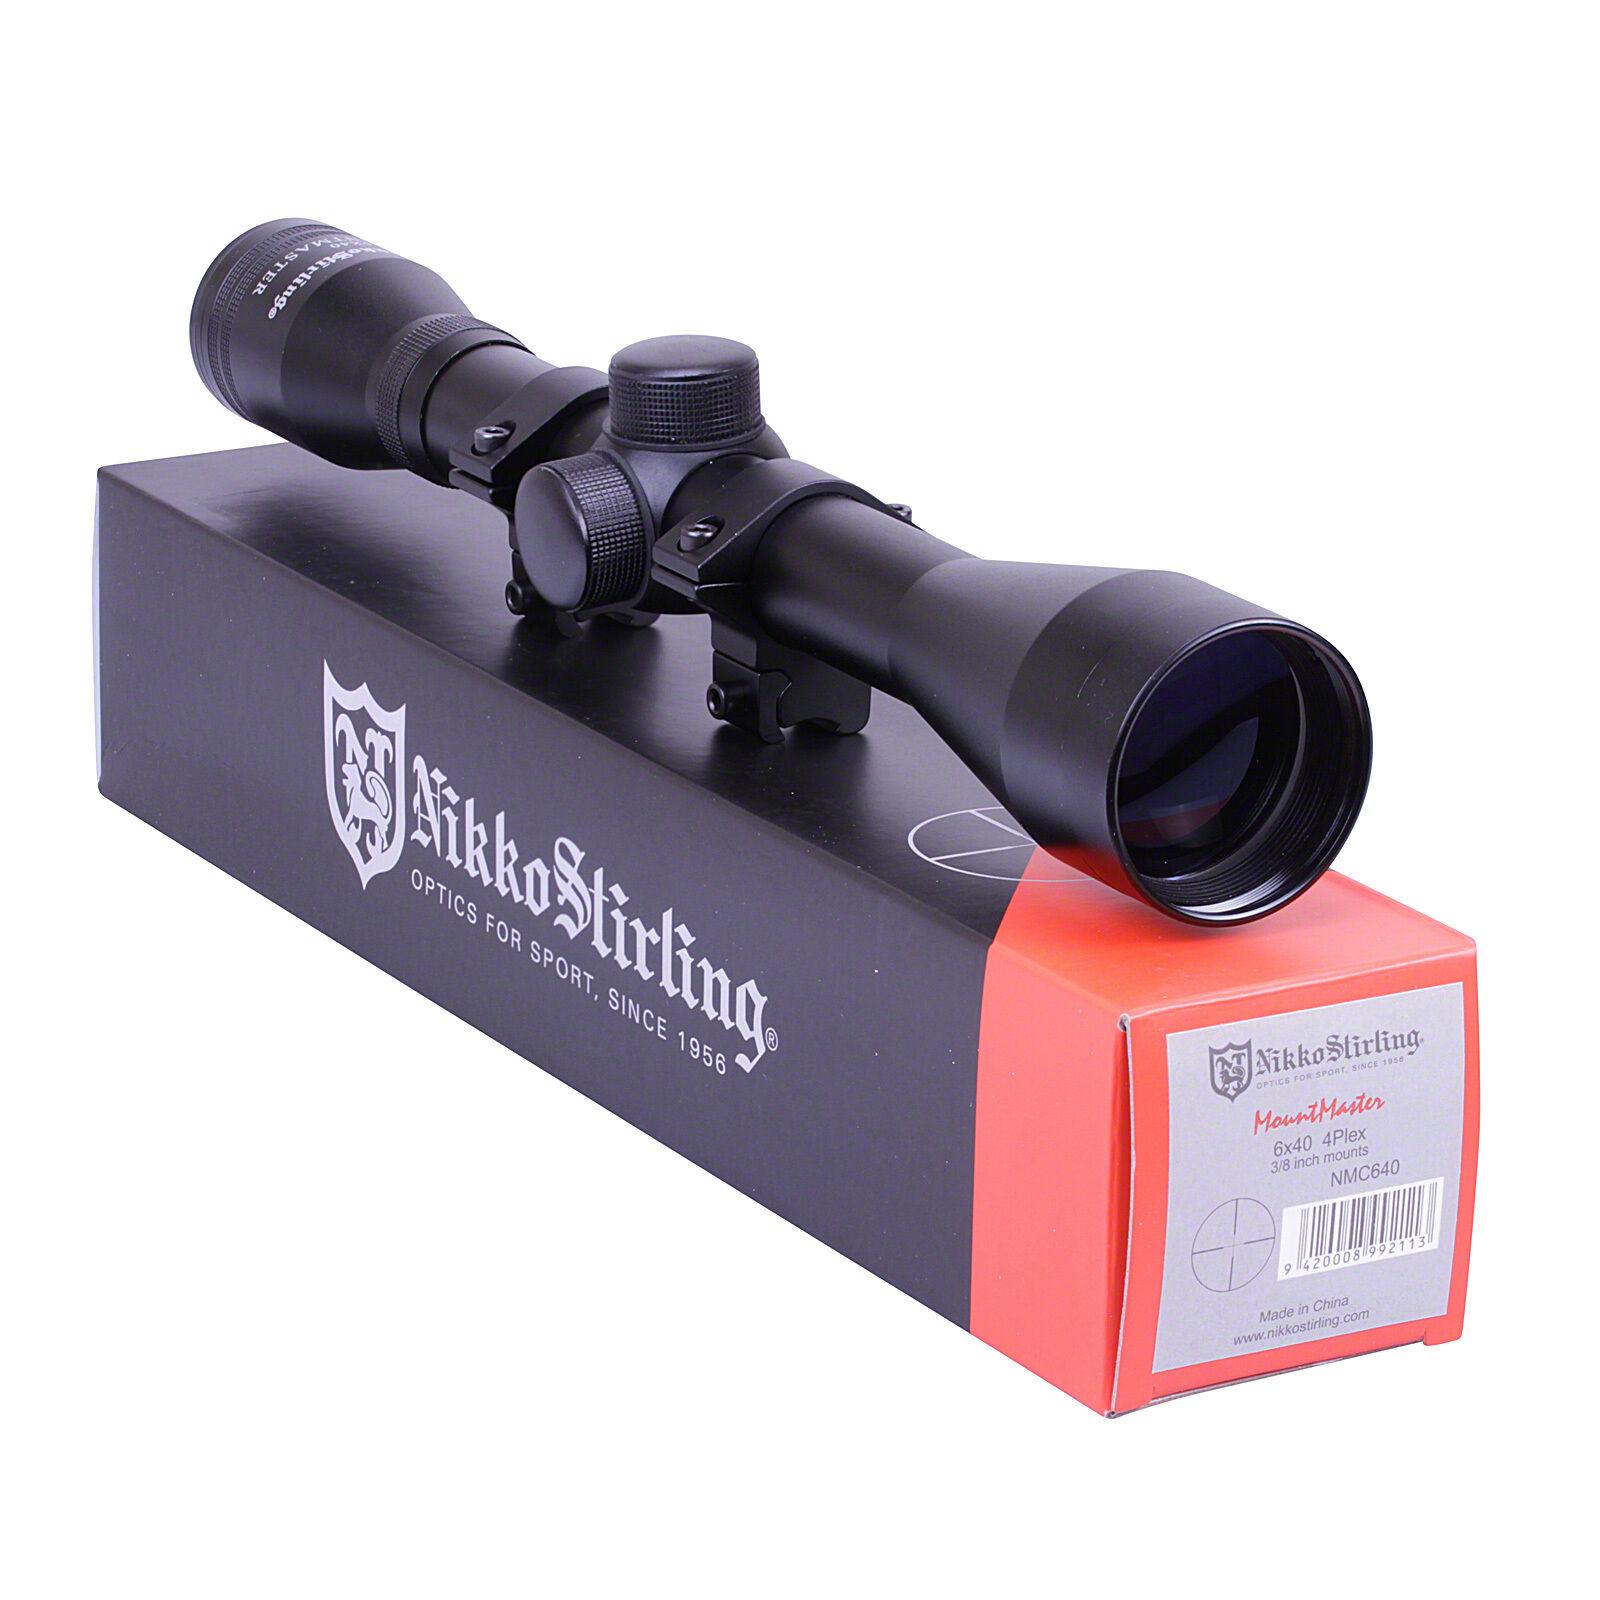 Nikko Stirling Mountmaster 6x40 RIFLESCOPE 11mm MOUNTS Rifle Scope Sight